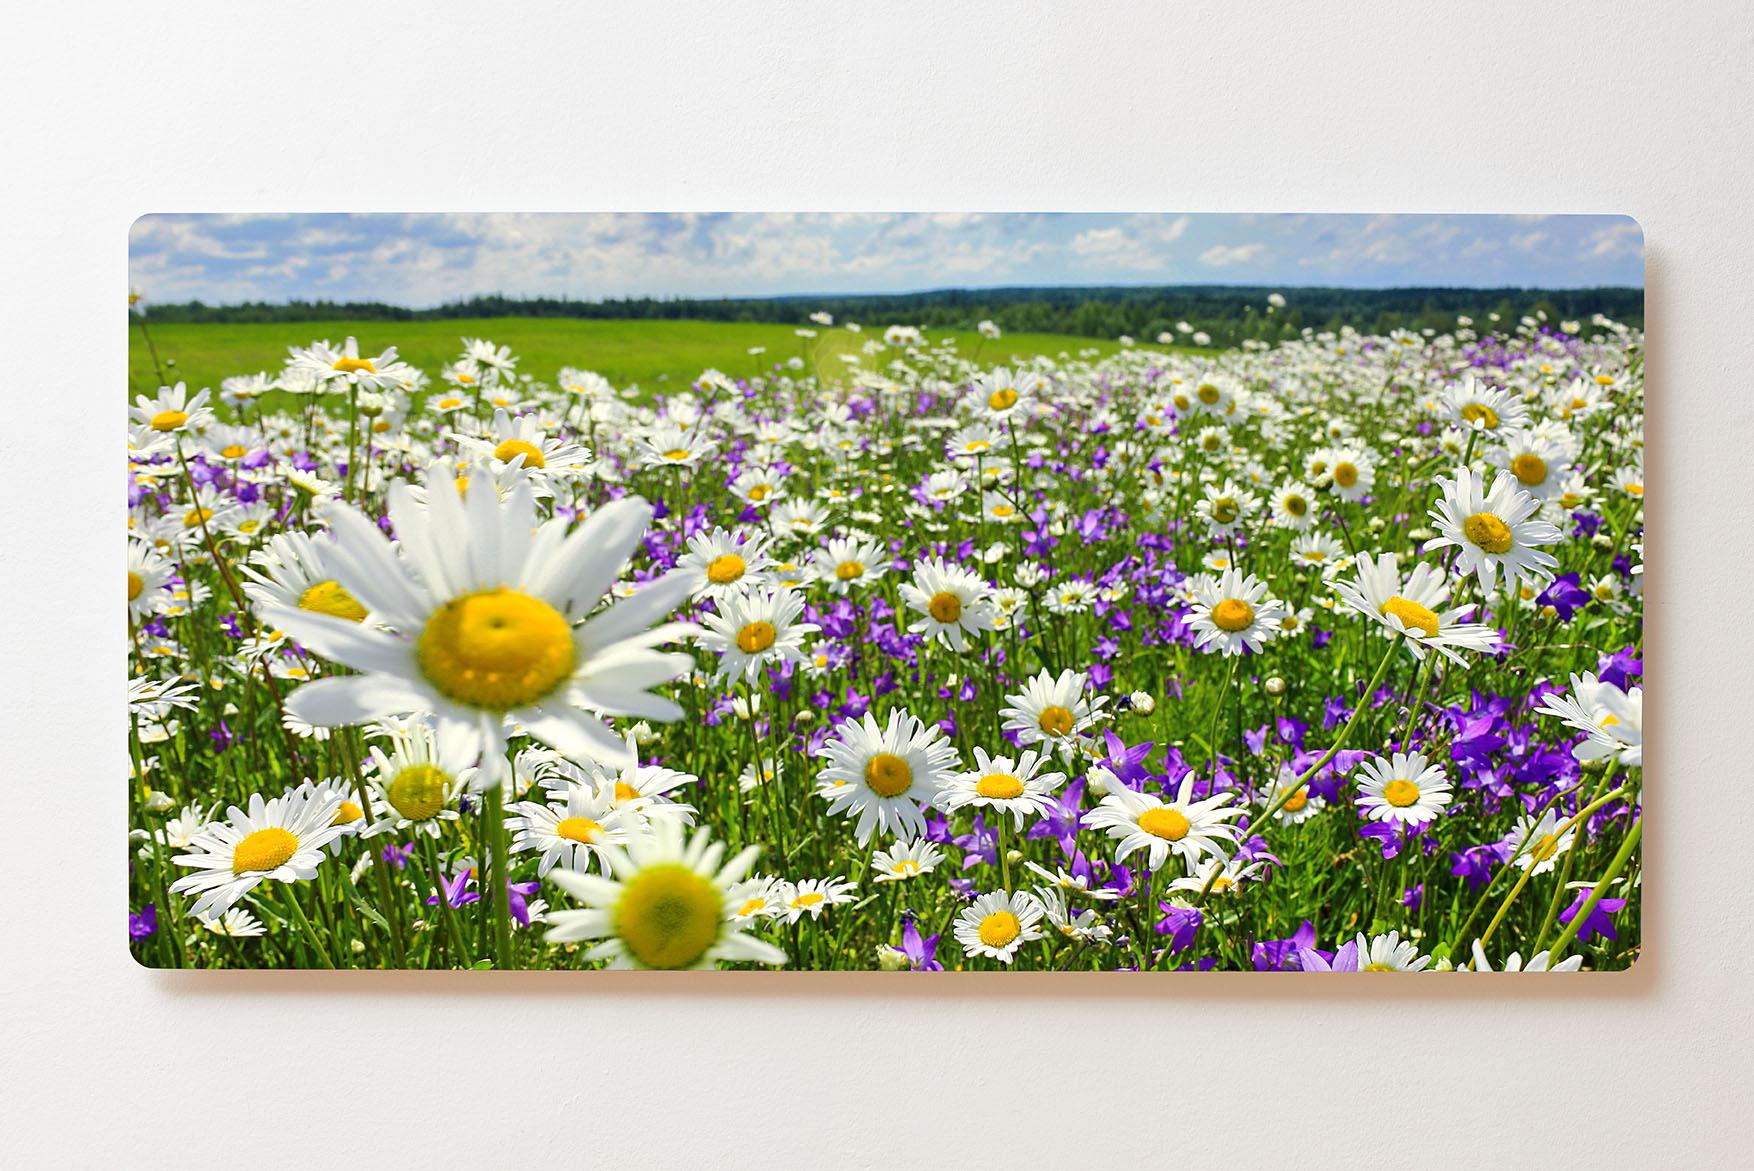 Magnettafel BACKLIGHT 120x60cm Motiv-Wandbild M156 Blumenwiese